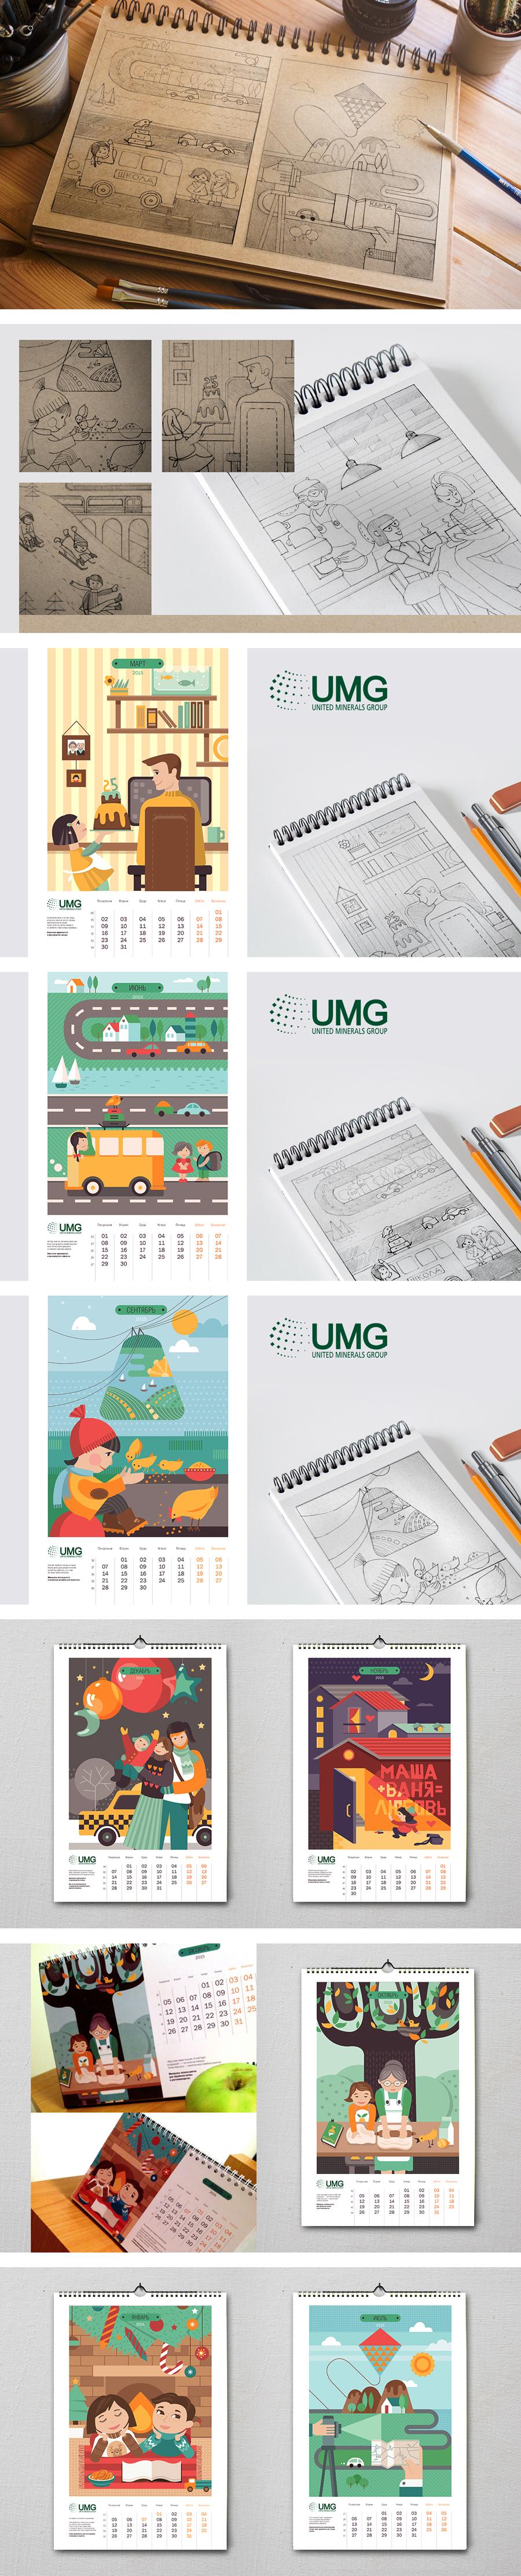 Illustrator Project Kiev